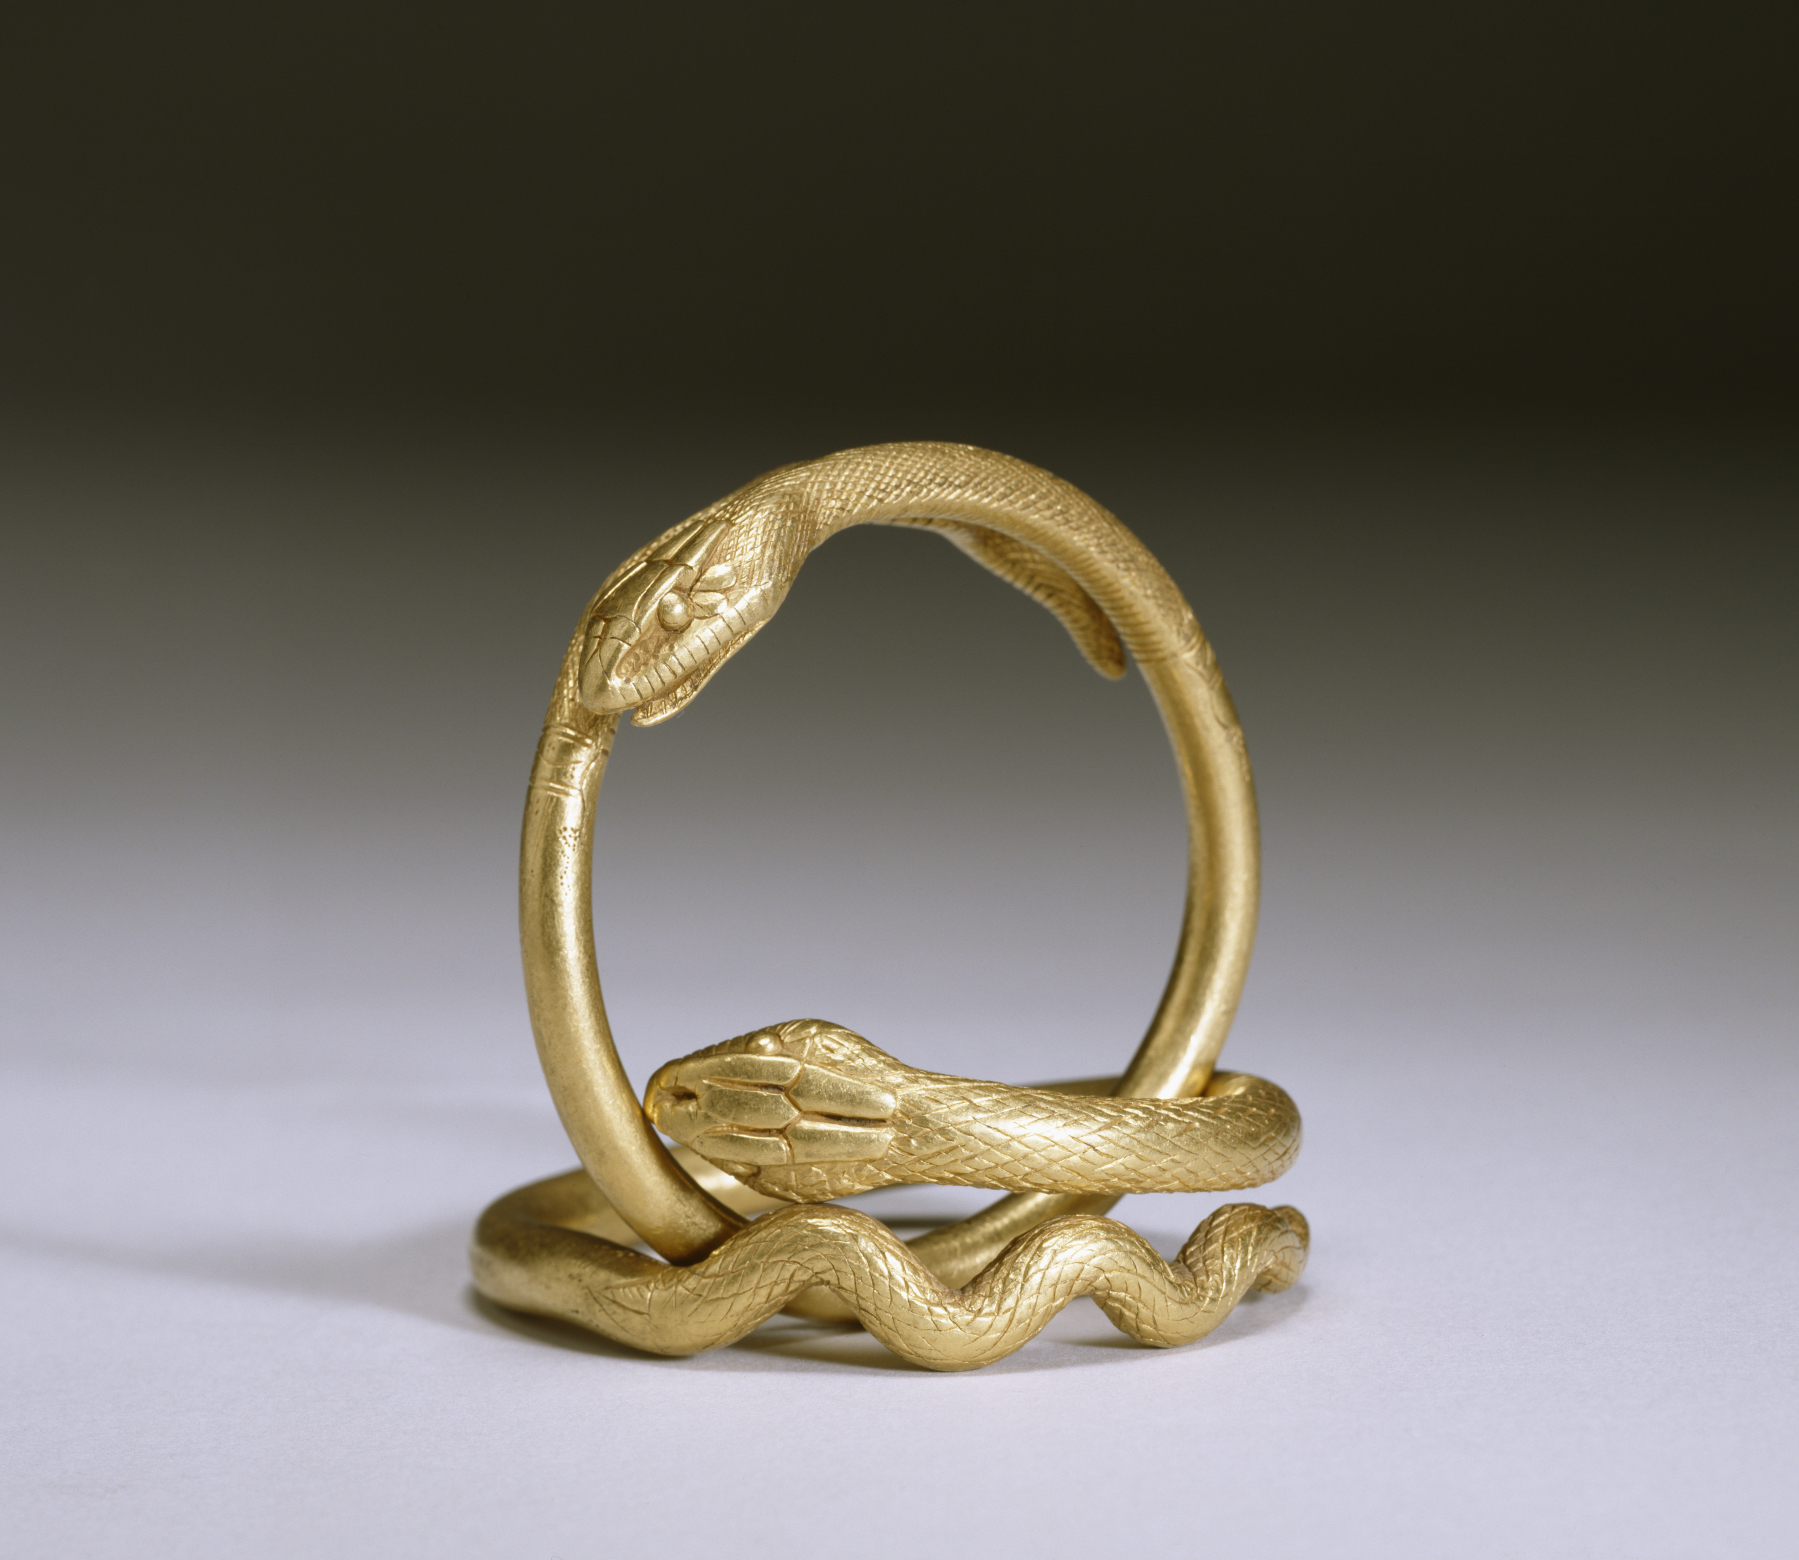 Gold Ring Around Items At Pokestops